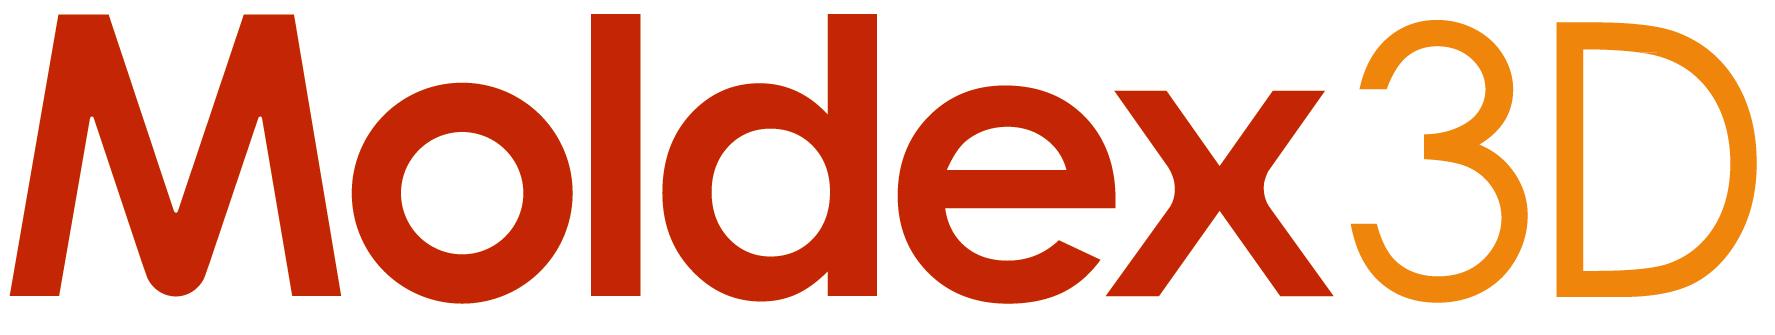 Moldex3D-Logo